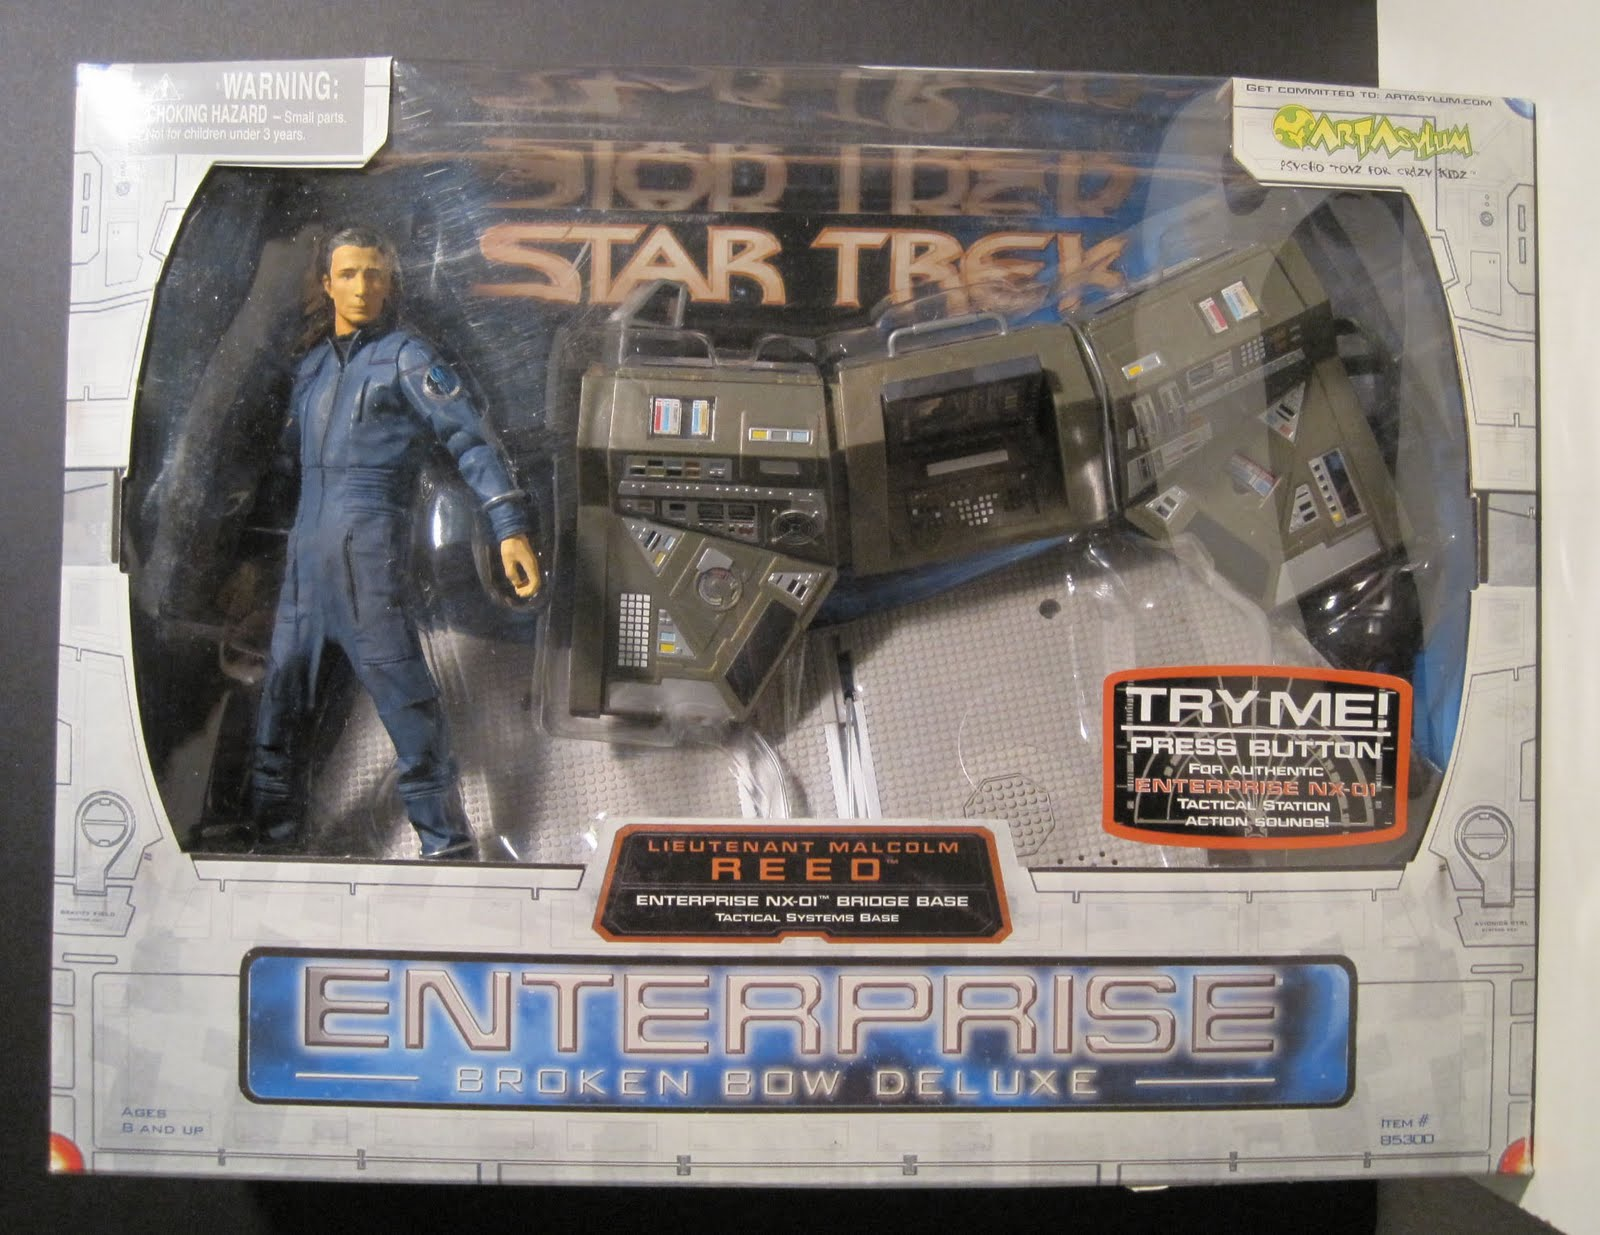 Toy Remix: Star Trek Enterprise Broken Bow Deluxe: Lt